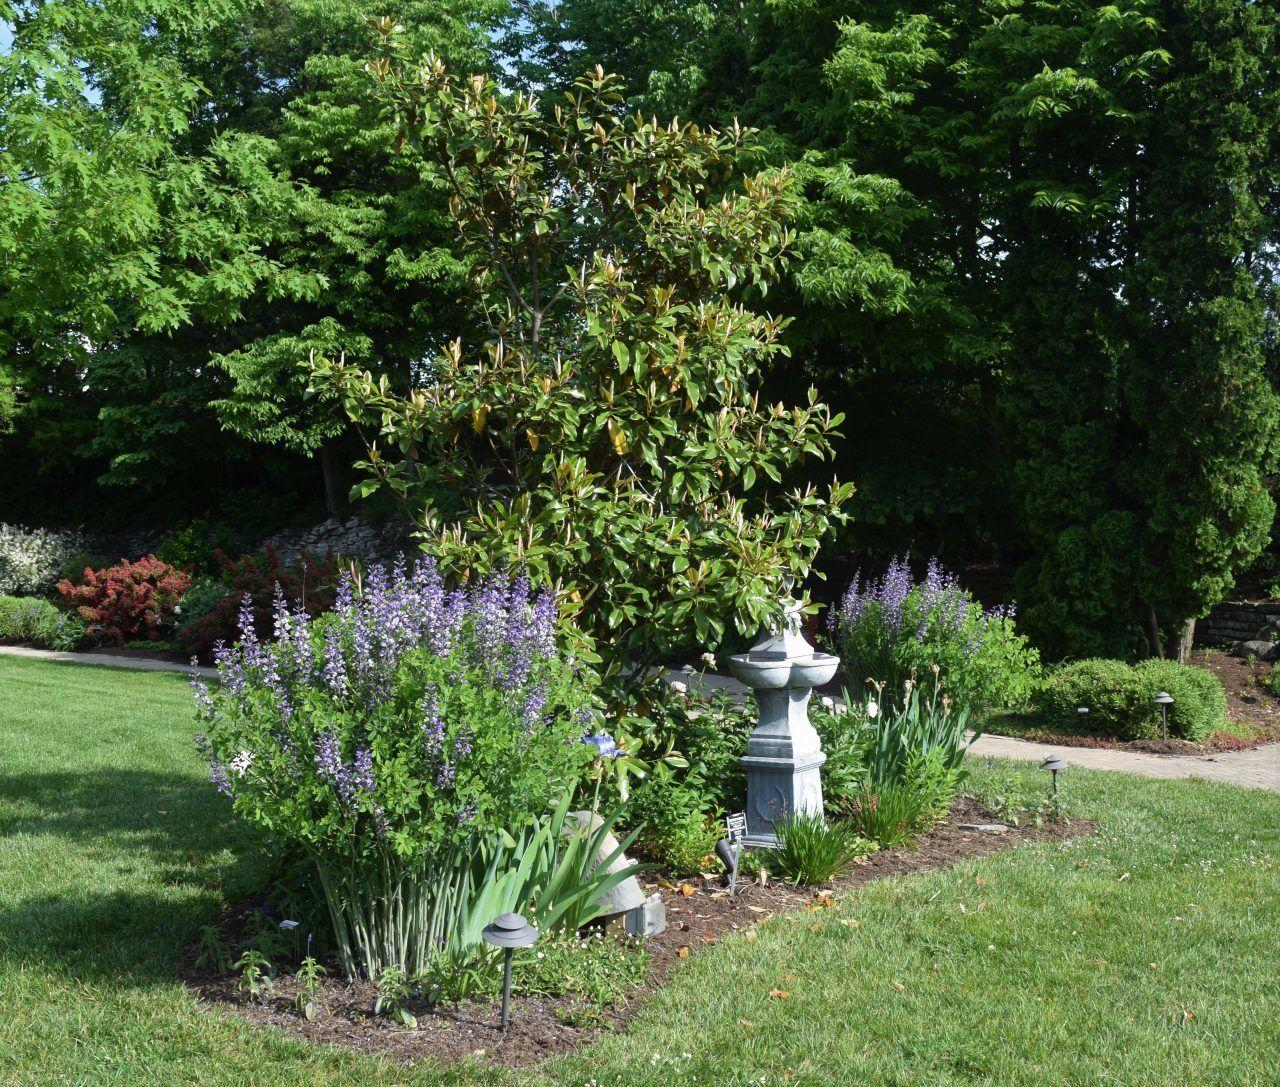 10. Charles Harper Garden